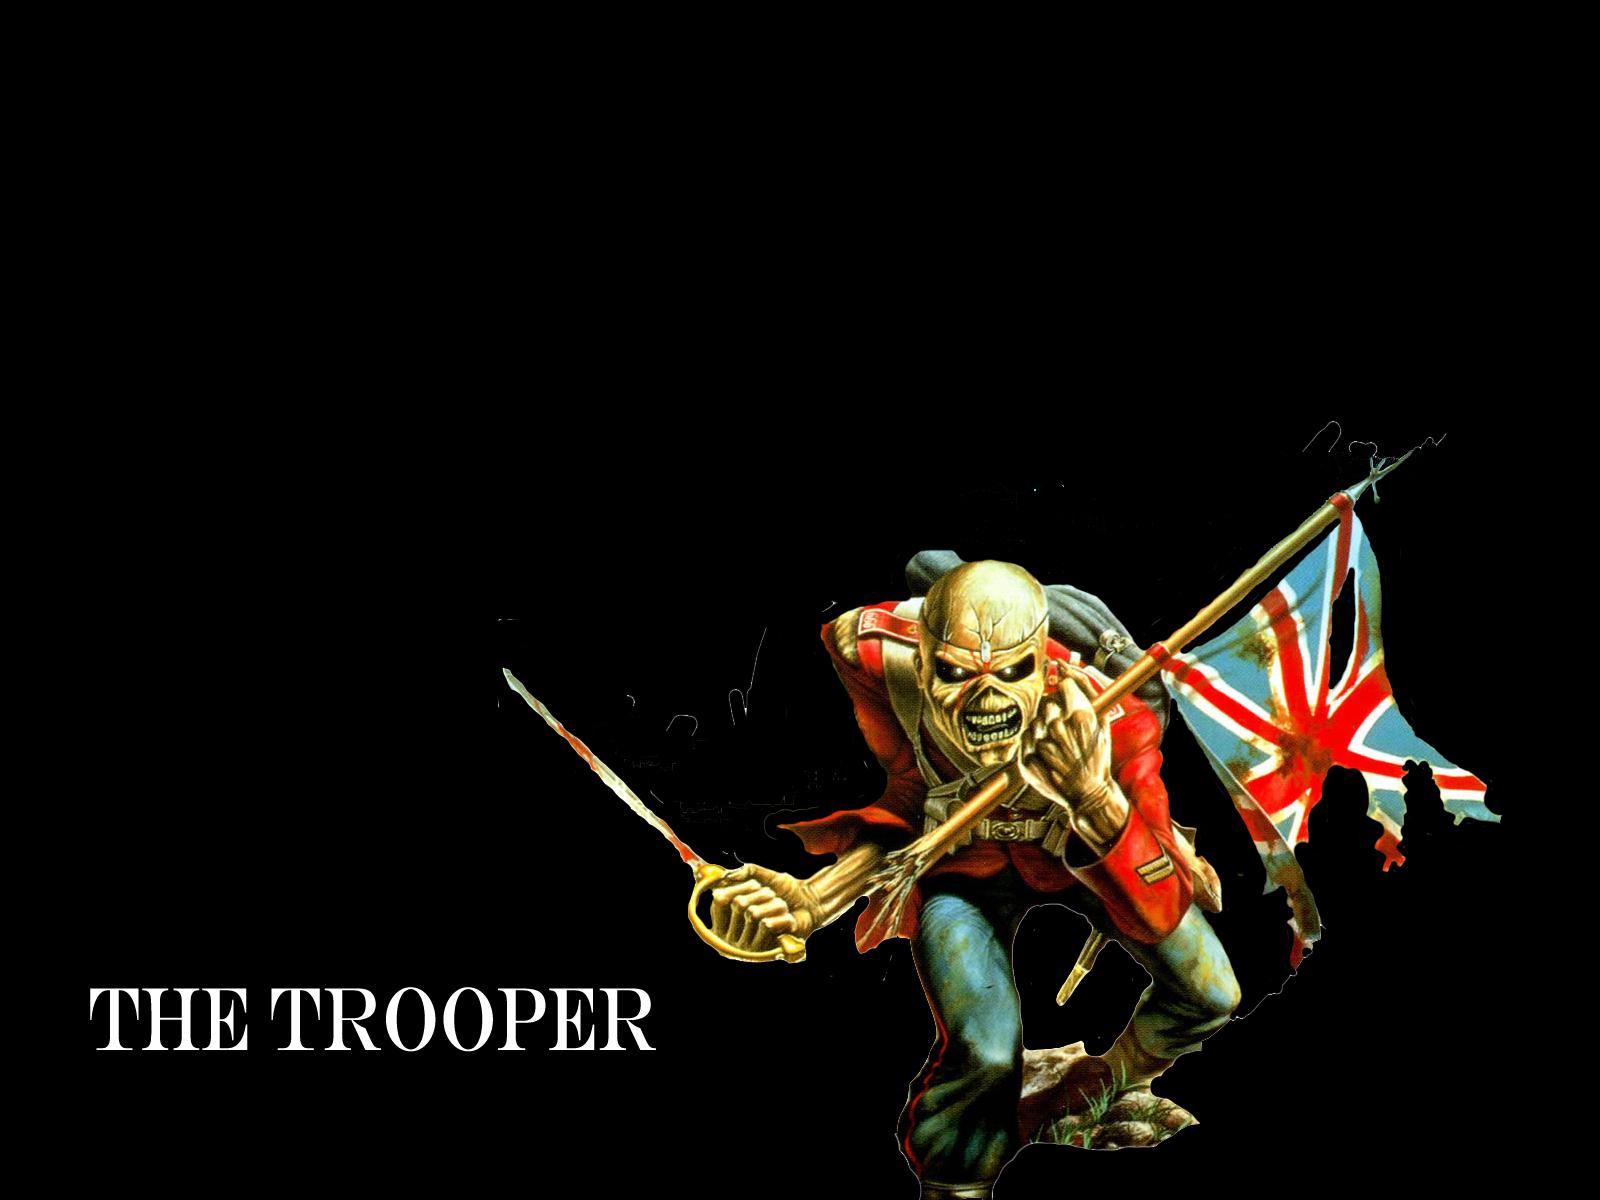 The Trooper by misterjamez on DeviantArt